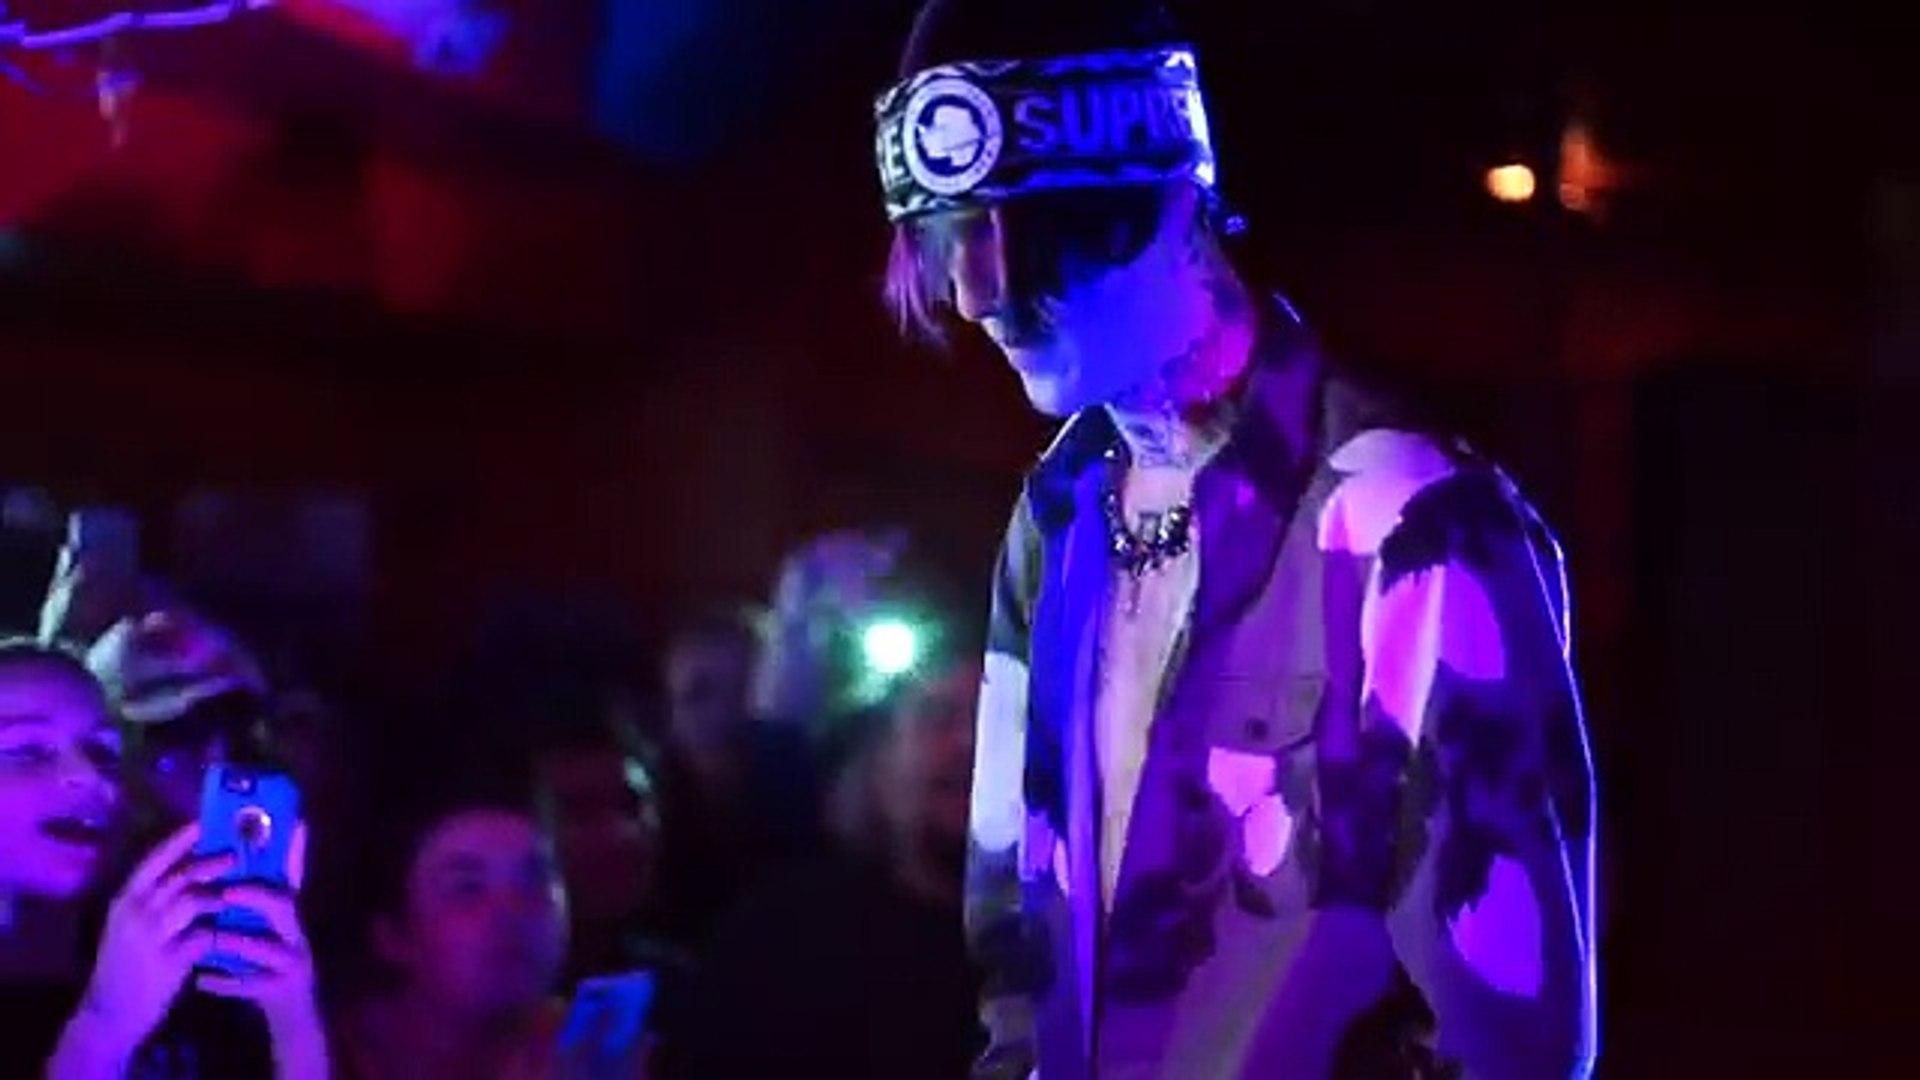 Lil Peep The Brightside Prod Smokeasac Video Dailymotion